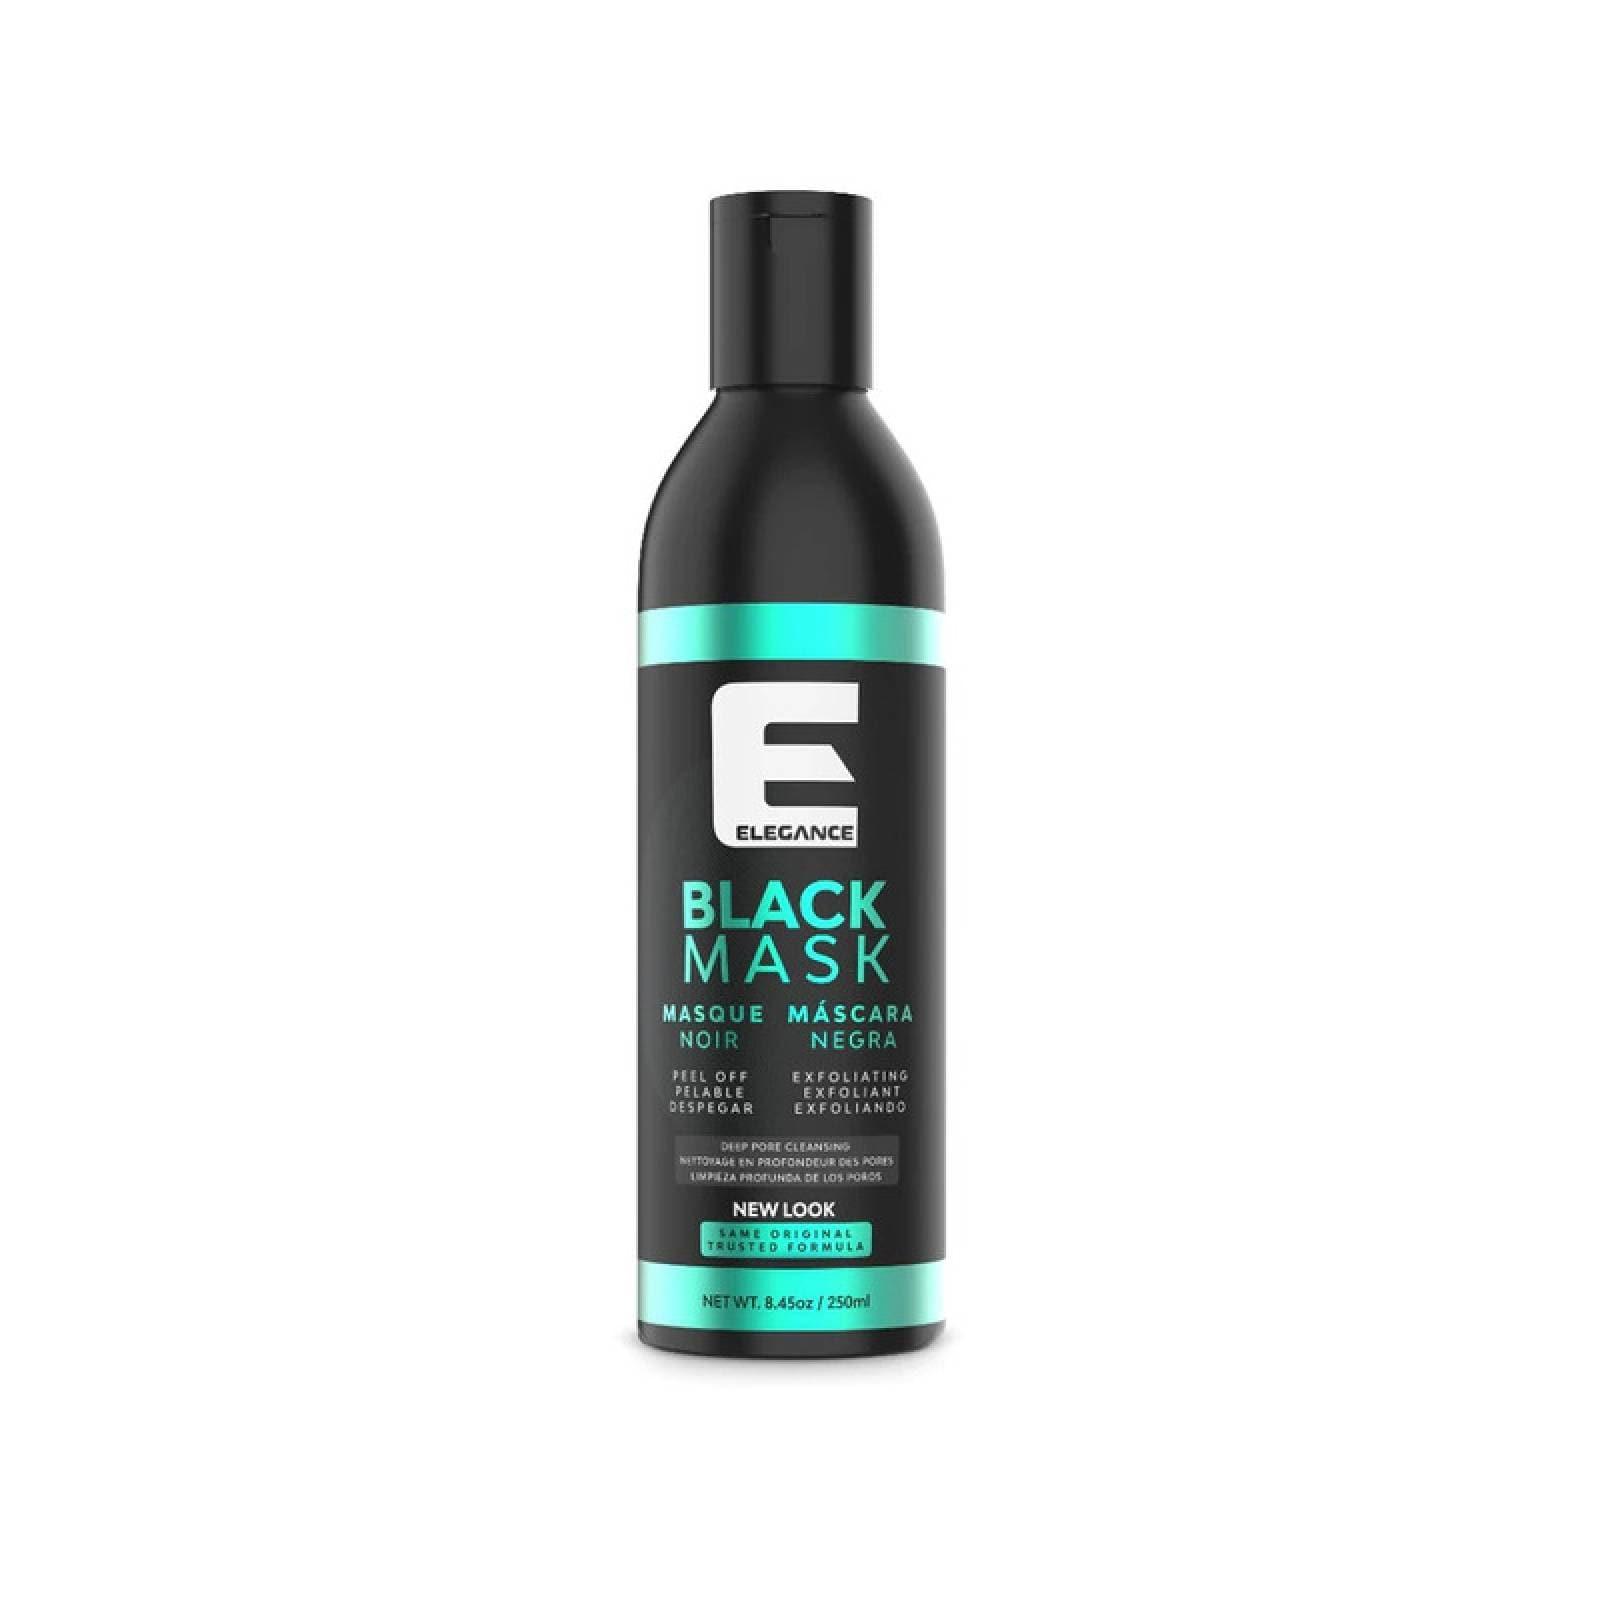 Mascarilla Facial Exfoliante Elegance 250 ml , Mascarilla Negra para Poros abiertos, Limpieza Profunda.